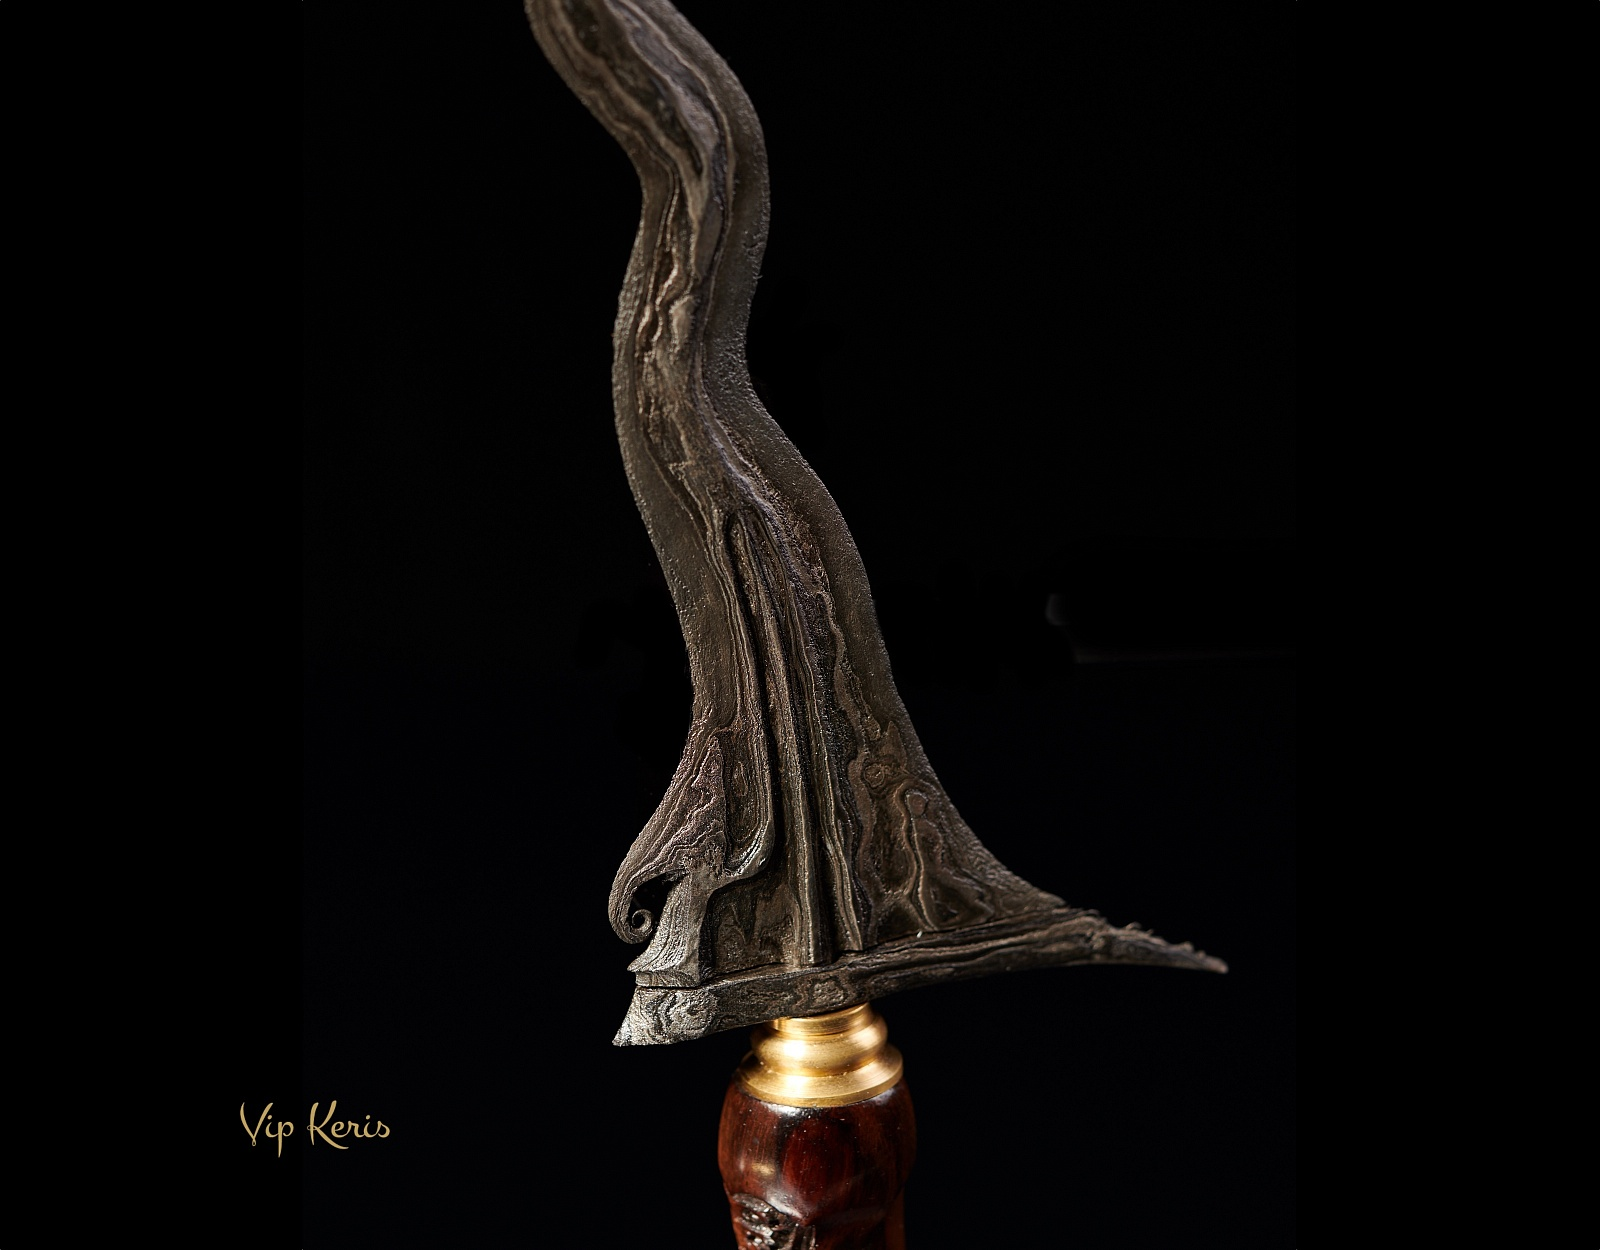 Пламевидный кинжал Крис Sengkelat Luk13, 7 аркан, Наг фото VipKeris